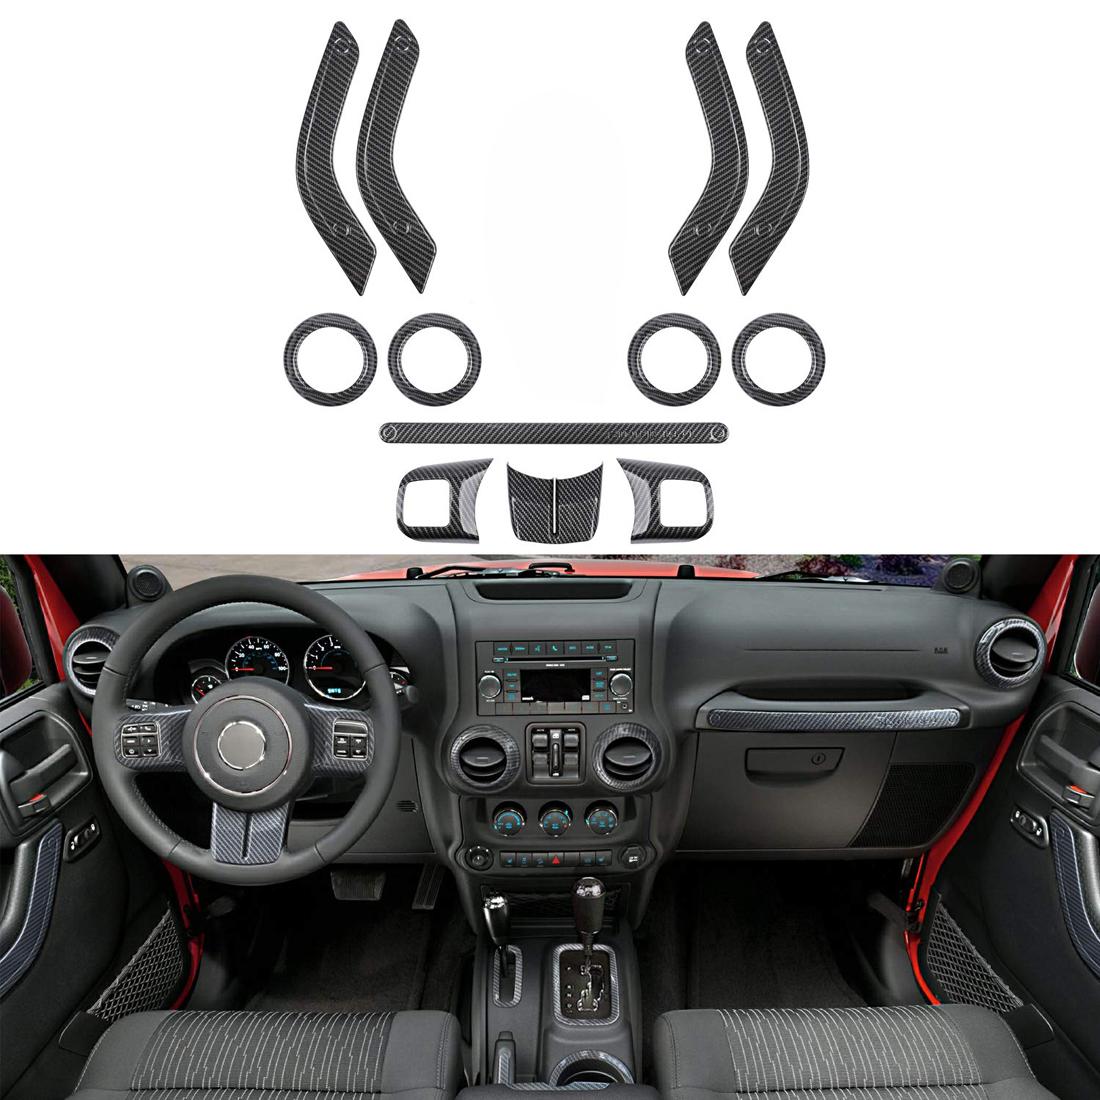 Jeep Wrangler Accessories 2017 >> Details About 12pcs Carbon Fiber Interior Accessory Decoration Cover Trim For Jeep Wrangler Jk